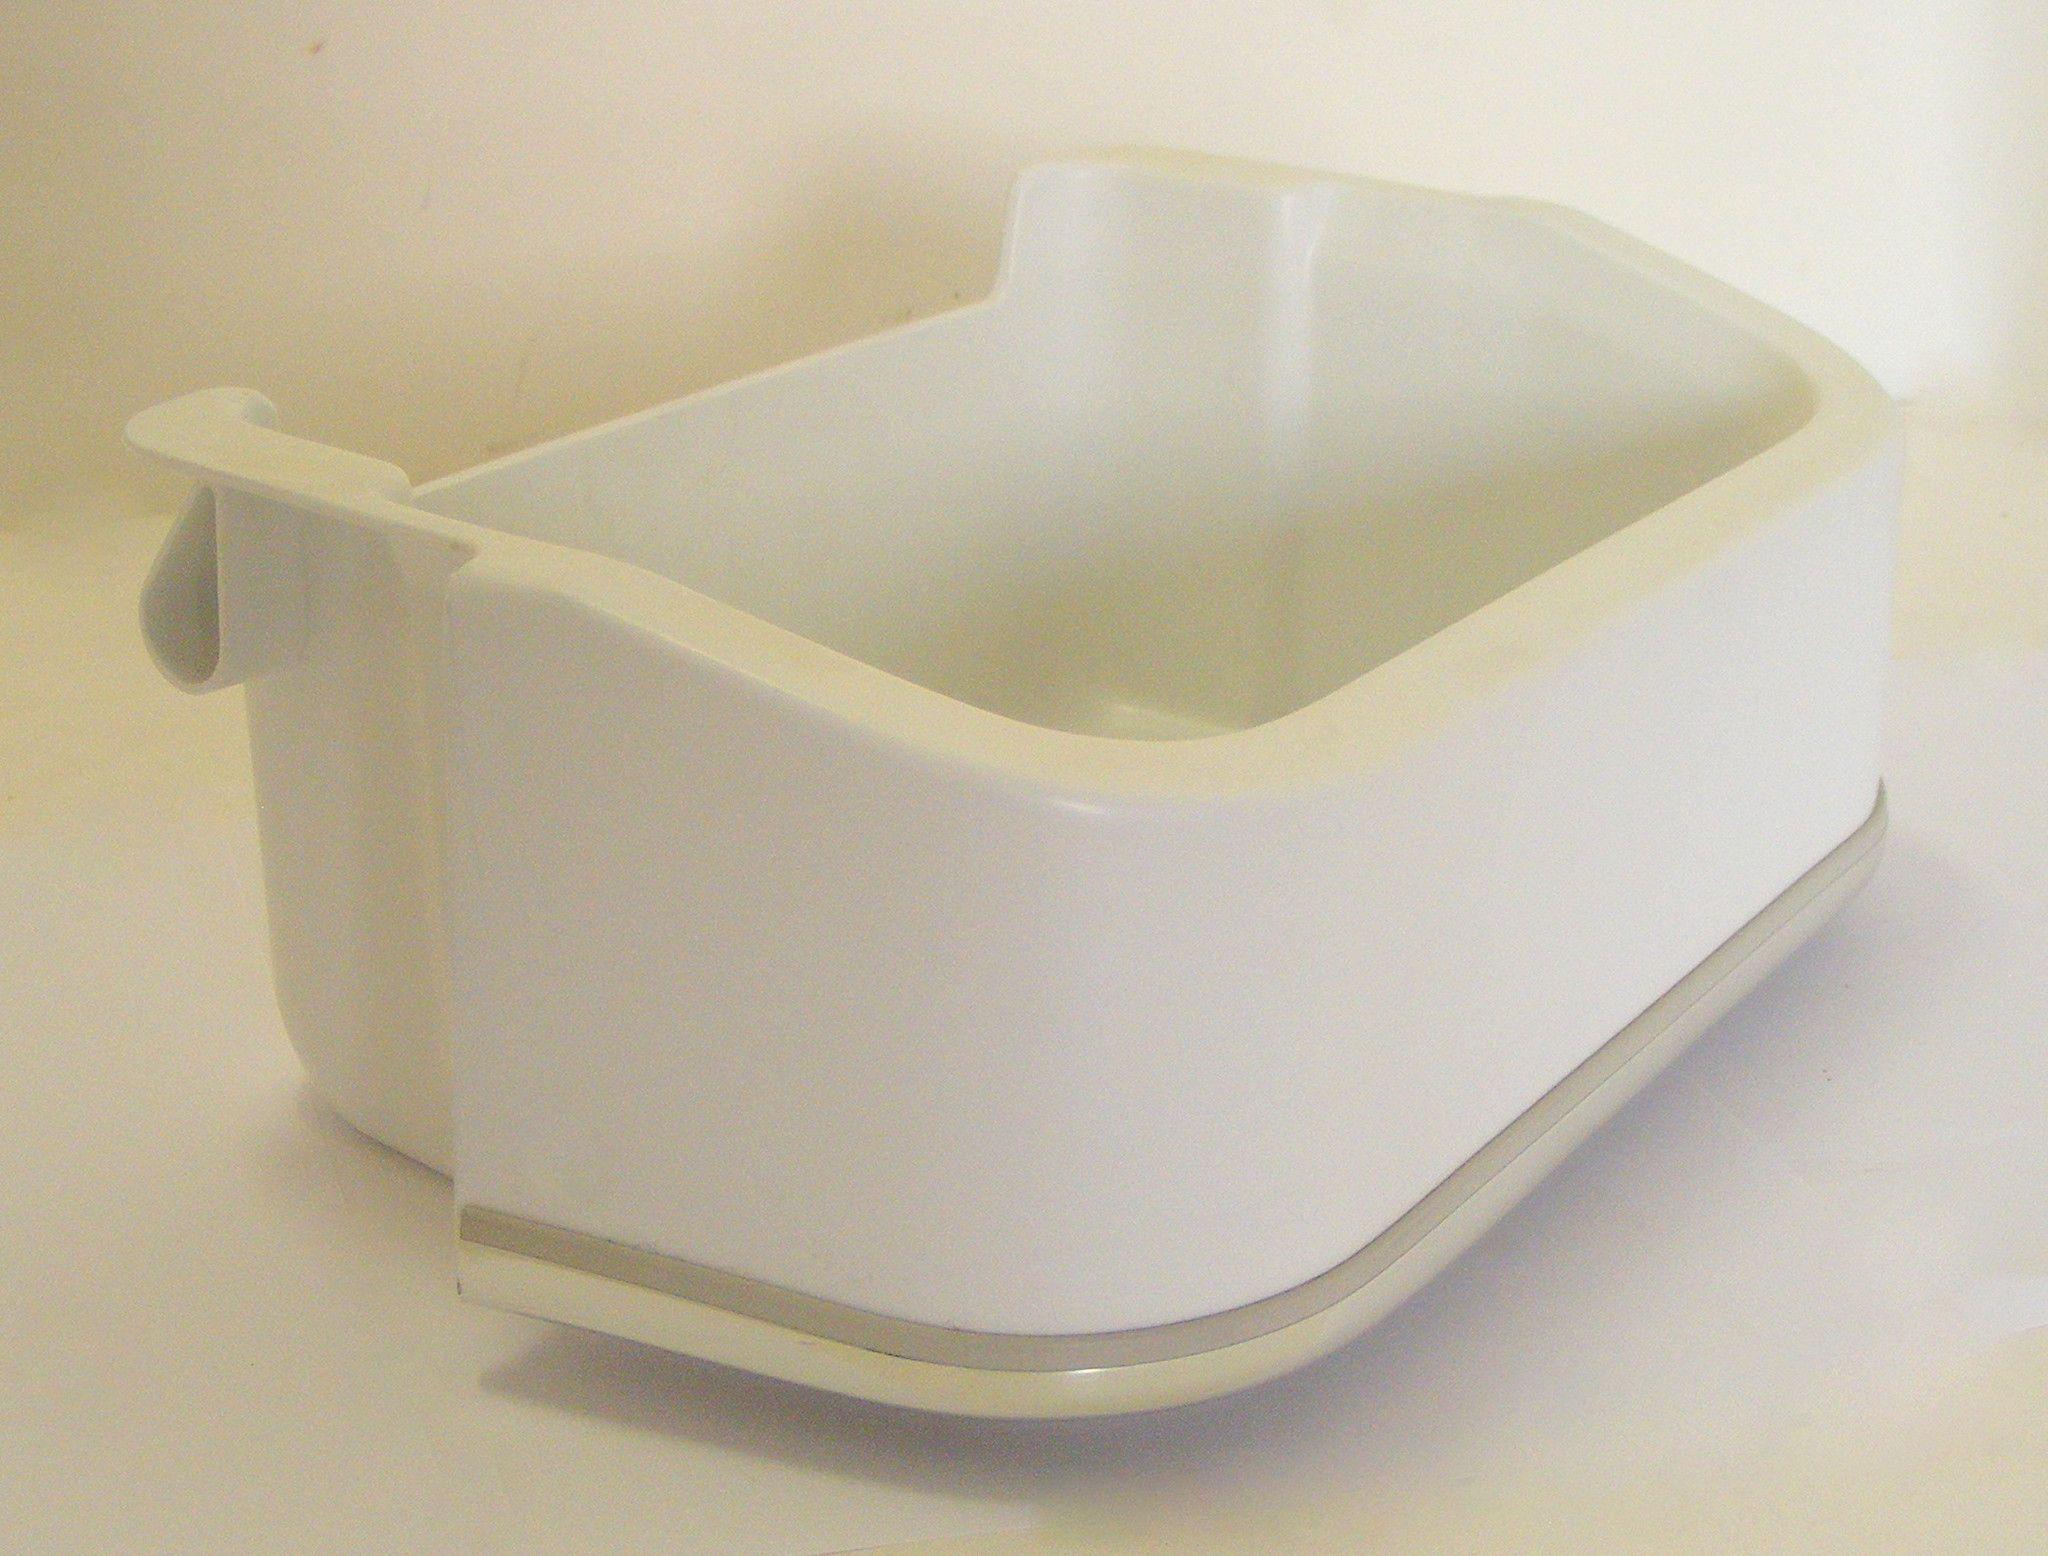 Frigidaire refrigerator small door bin 215441800 218592324 used